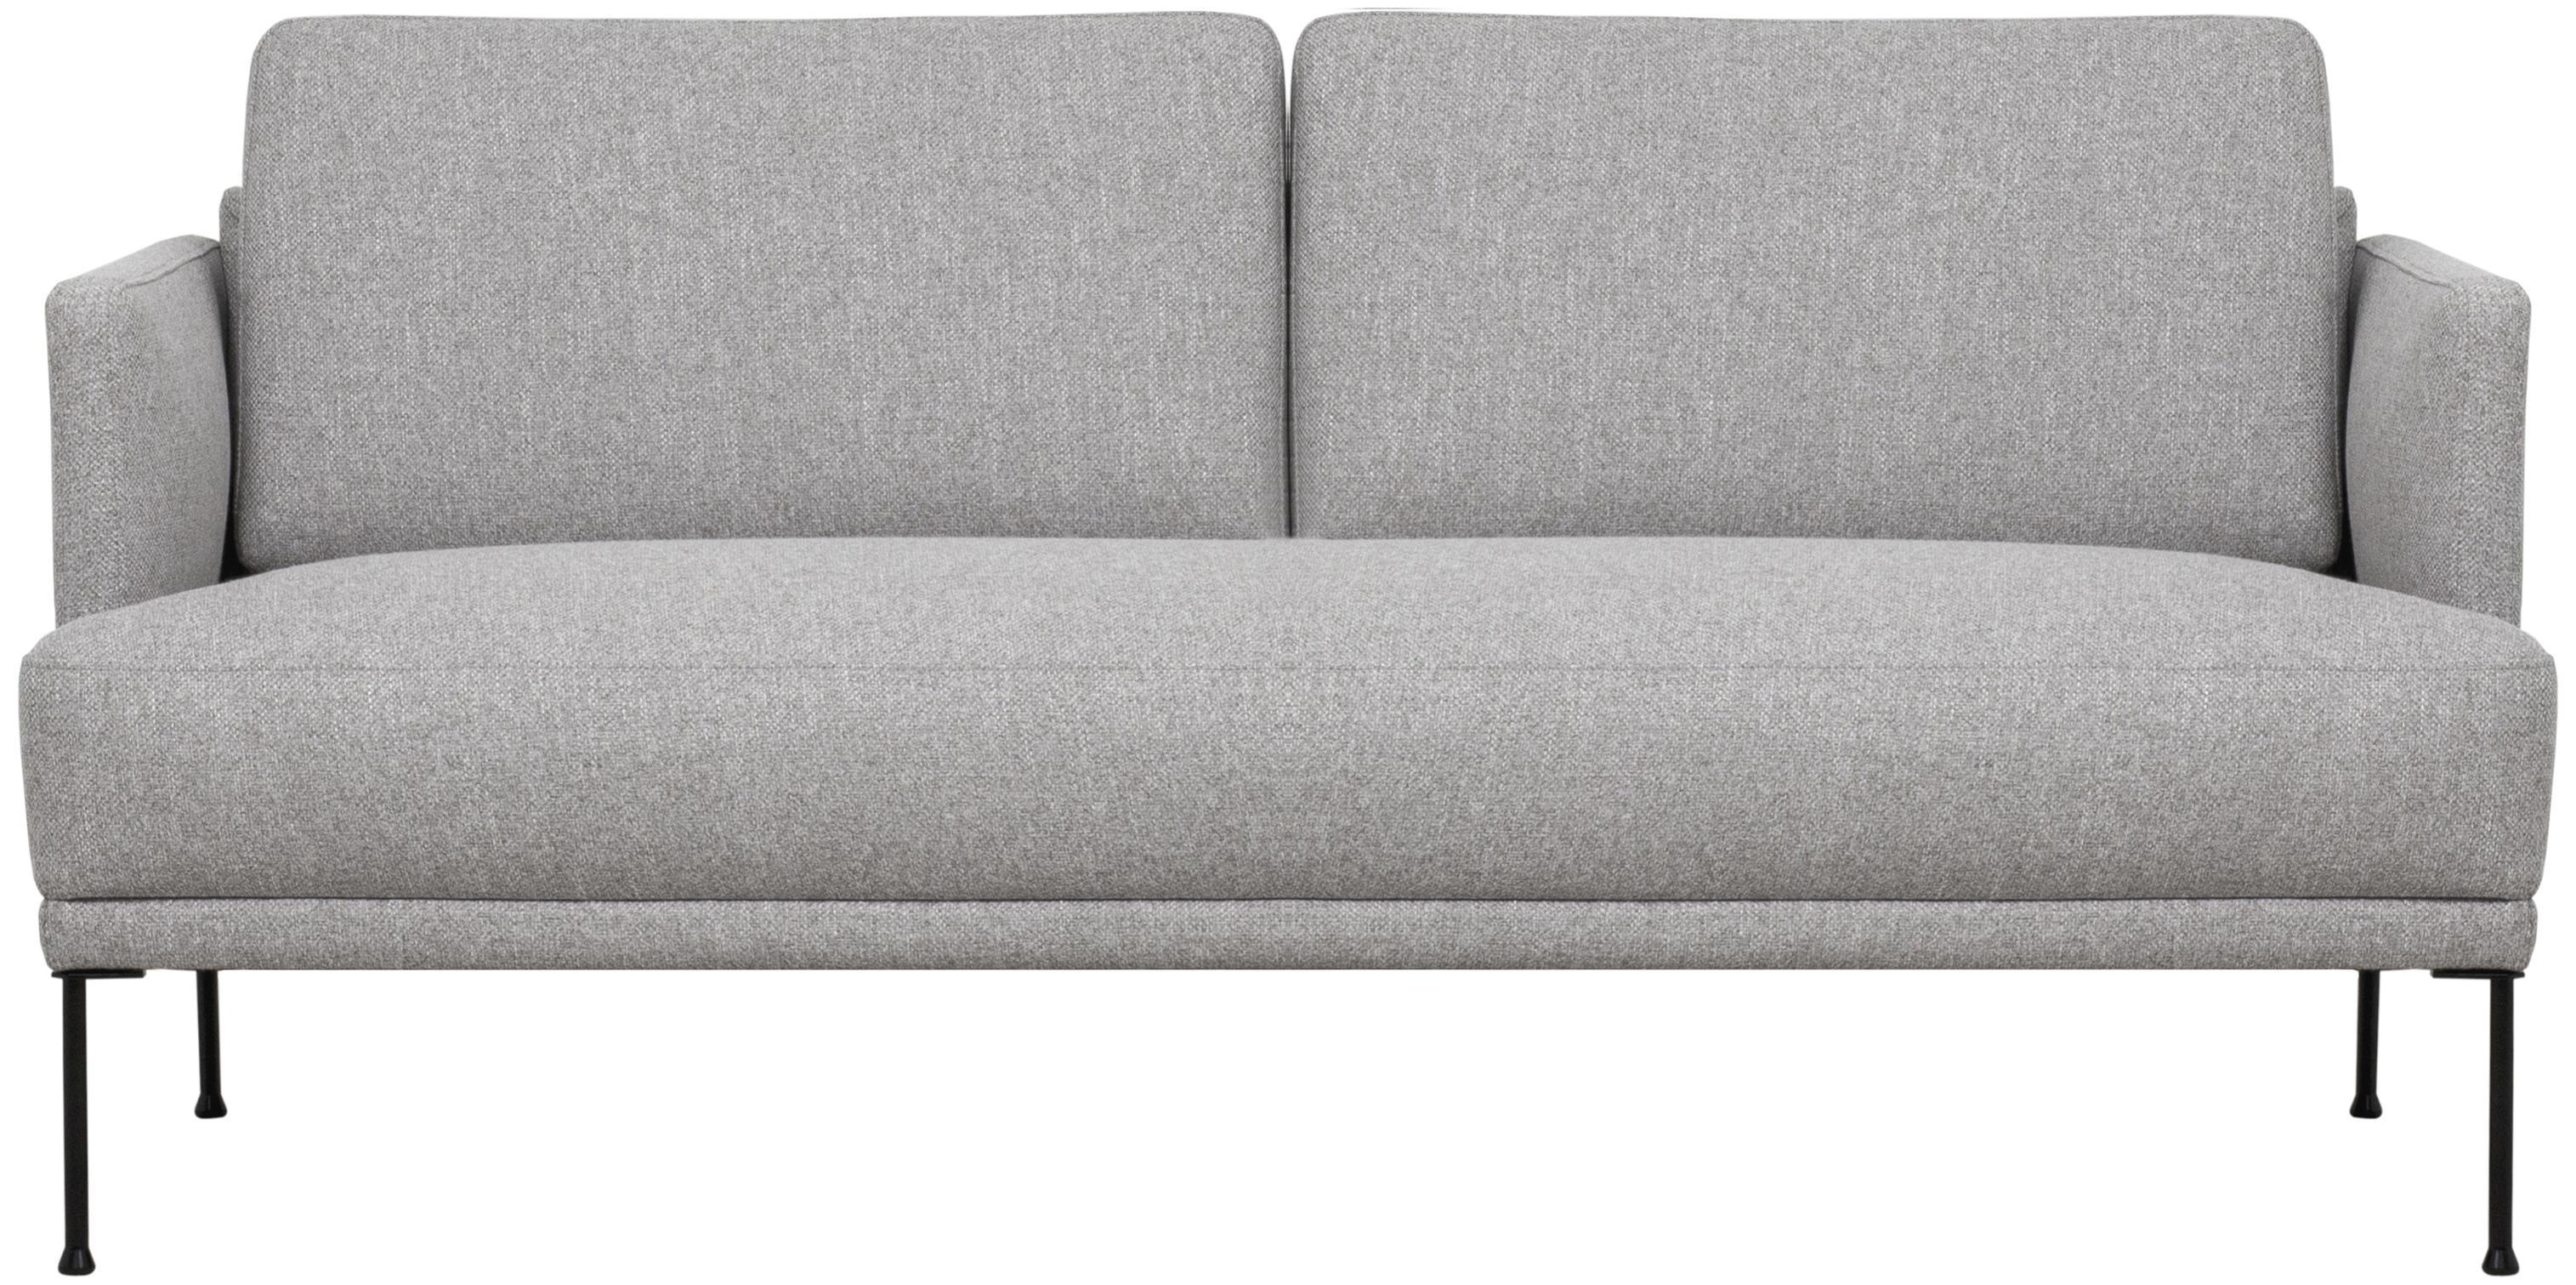 Sofa Fluente (2-Sitzer), Bezug: 80% Polyester, 20% Ramie , Gestell: Massives Kiefernholz, Füße: Metall, pulverbeschichtet, Webstoff Muster, B 166 x T 85 cm